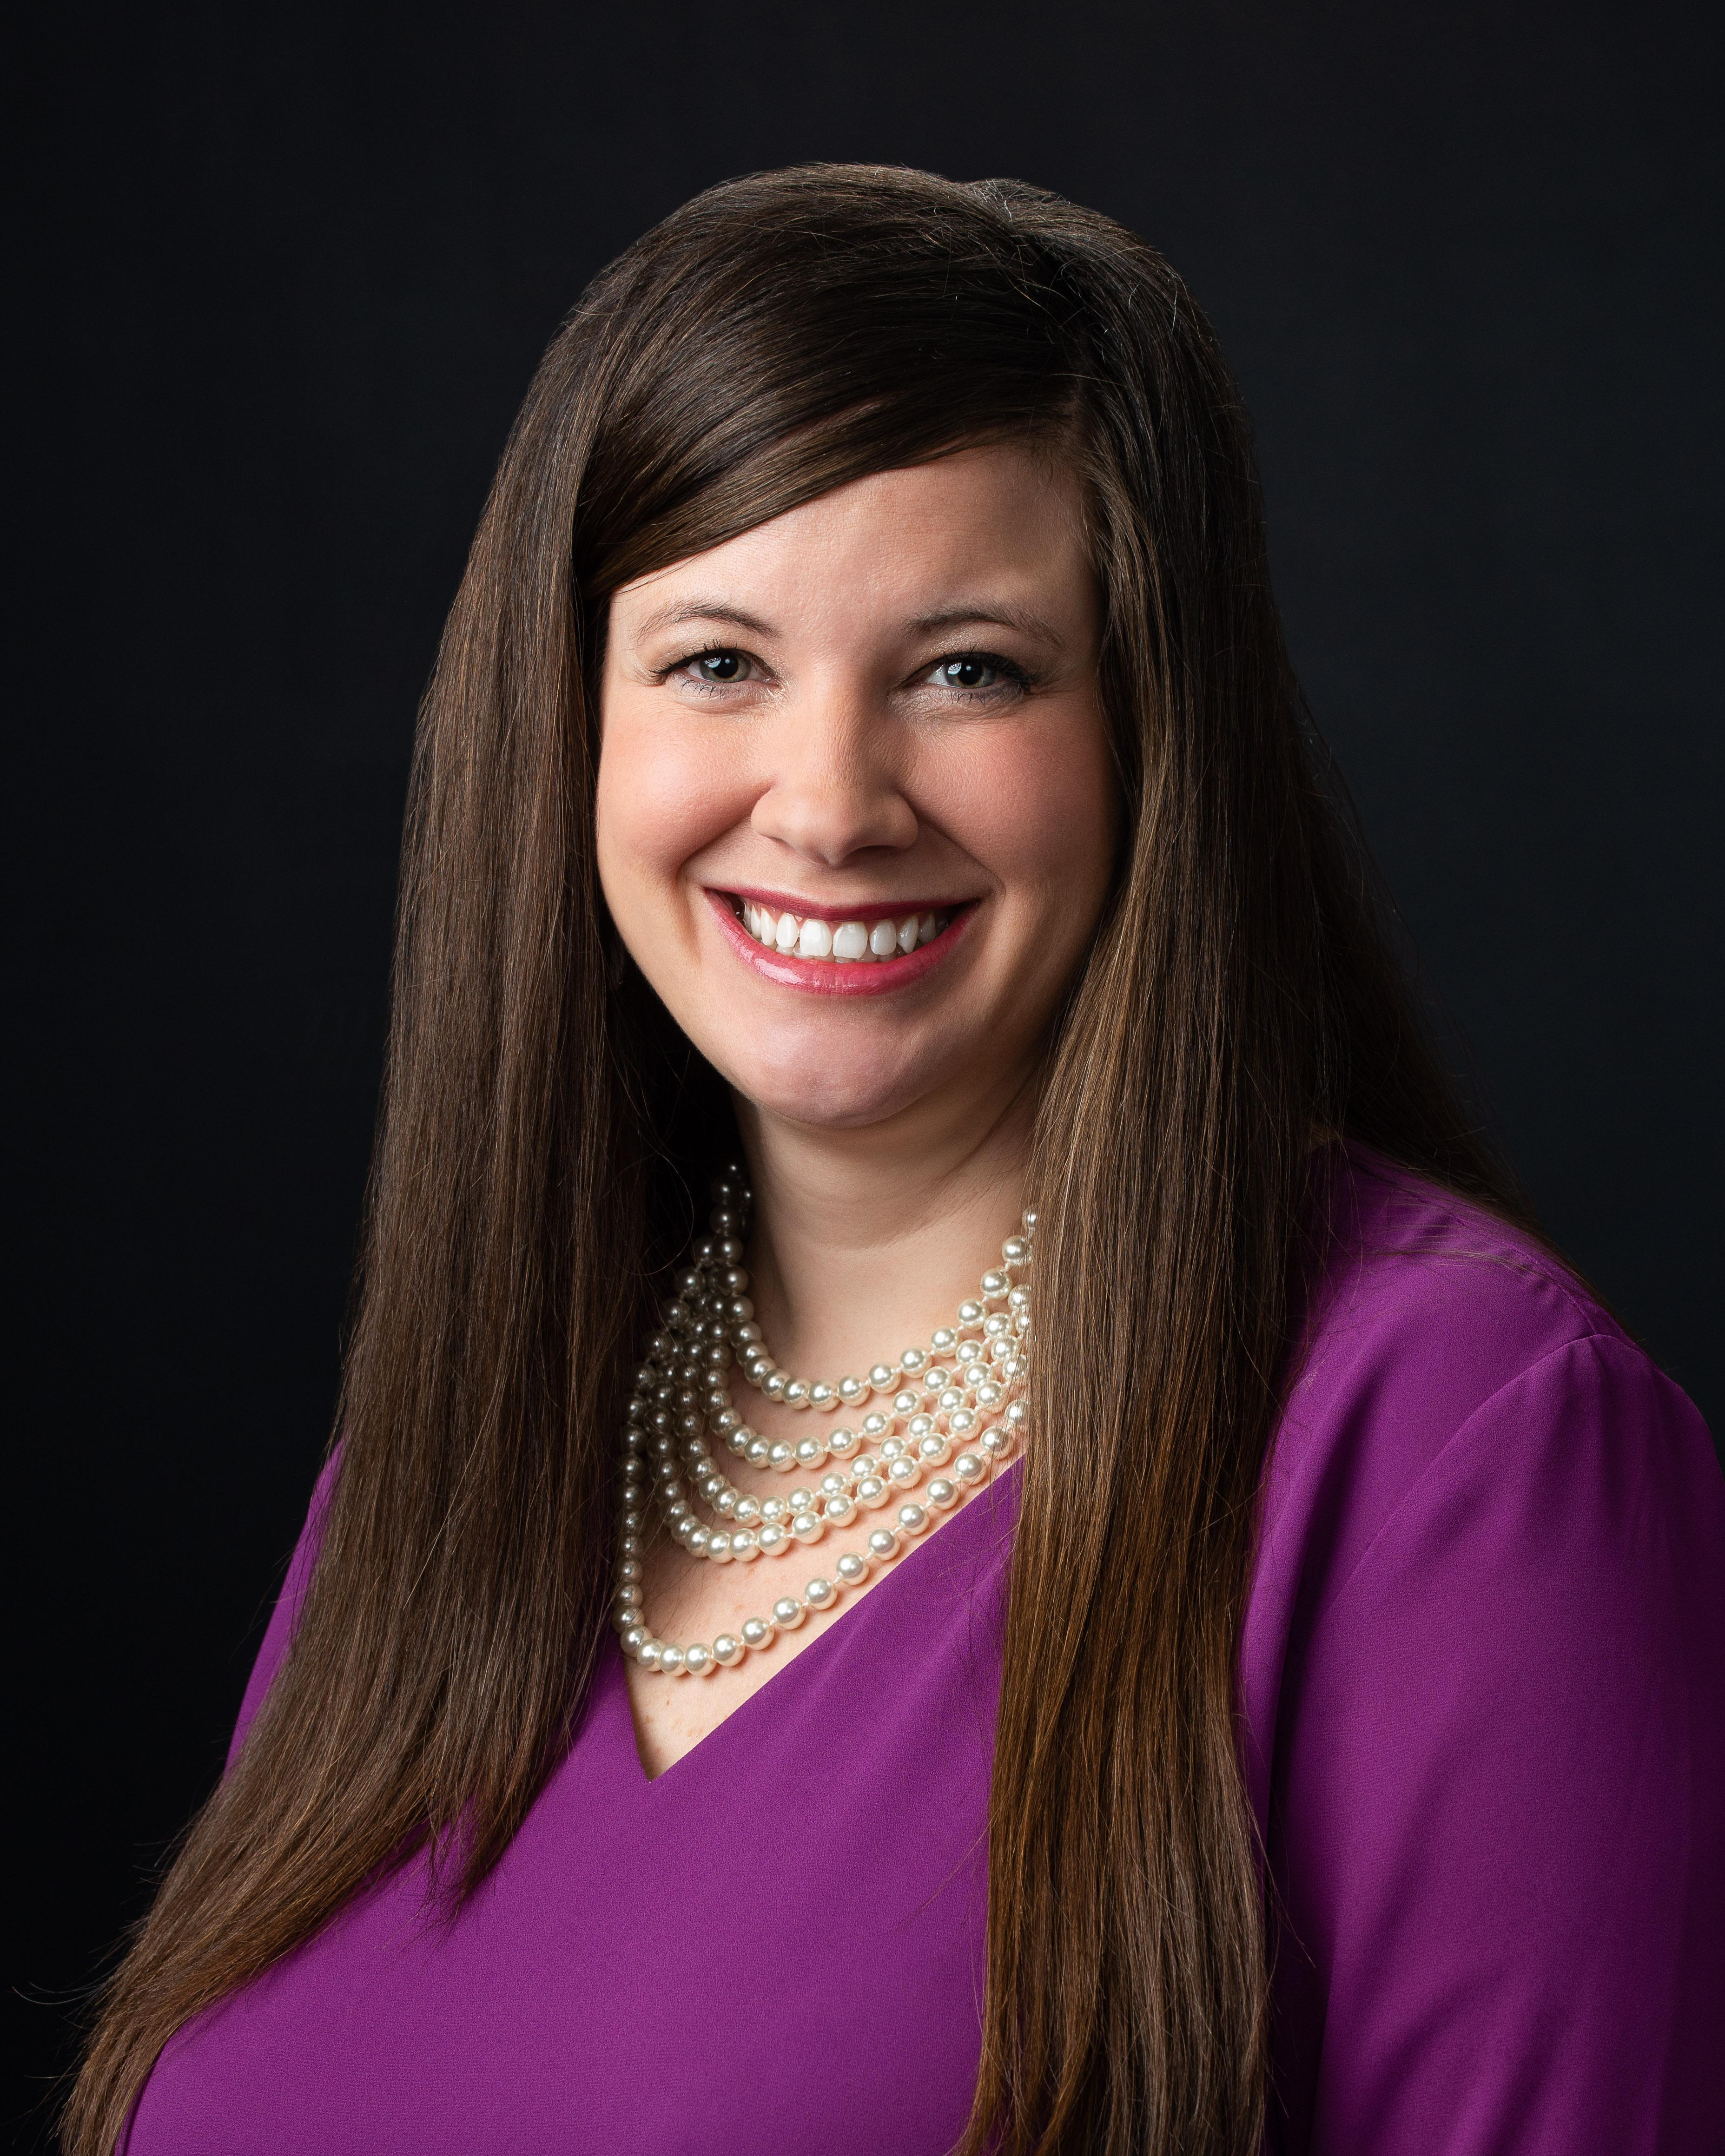 Stephanie Colwell